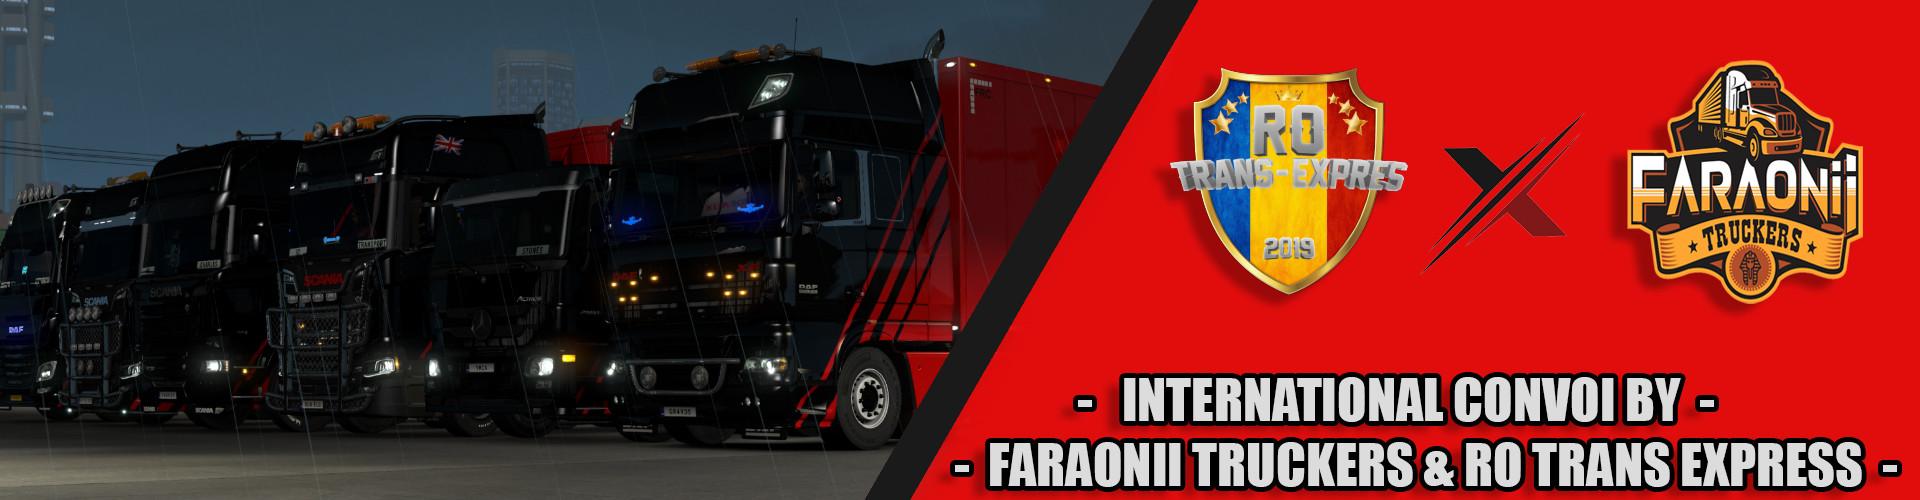 PUBLIC CONVOY BY FARAONII TRUCKERS & RO TRANS EXPRESS